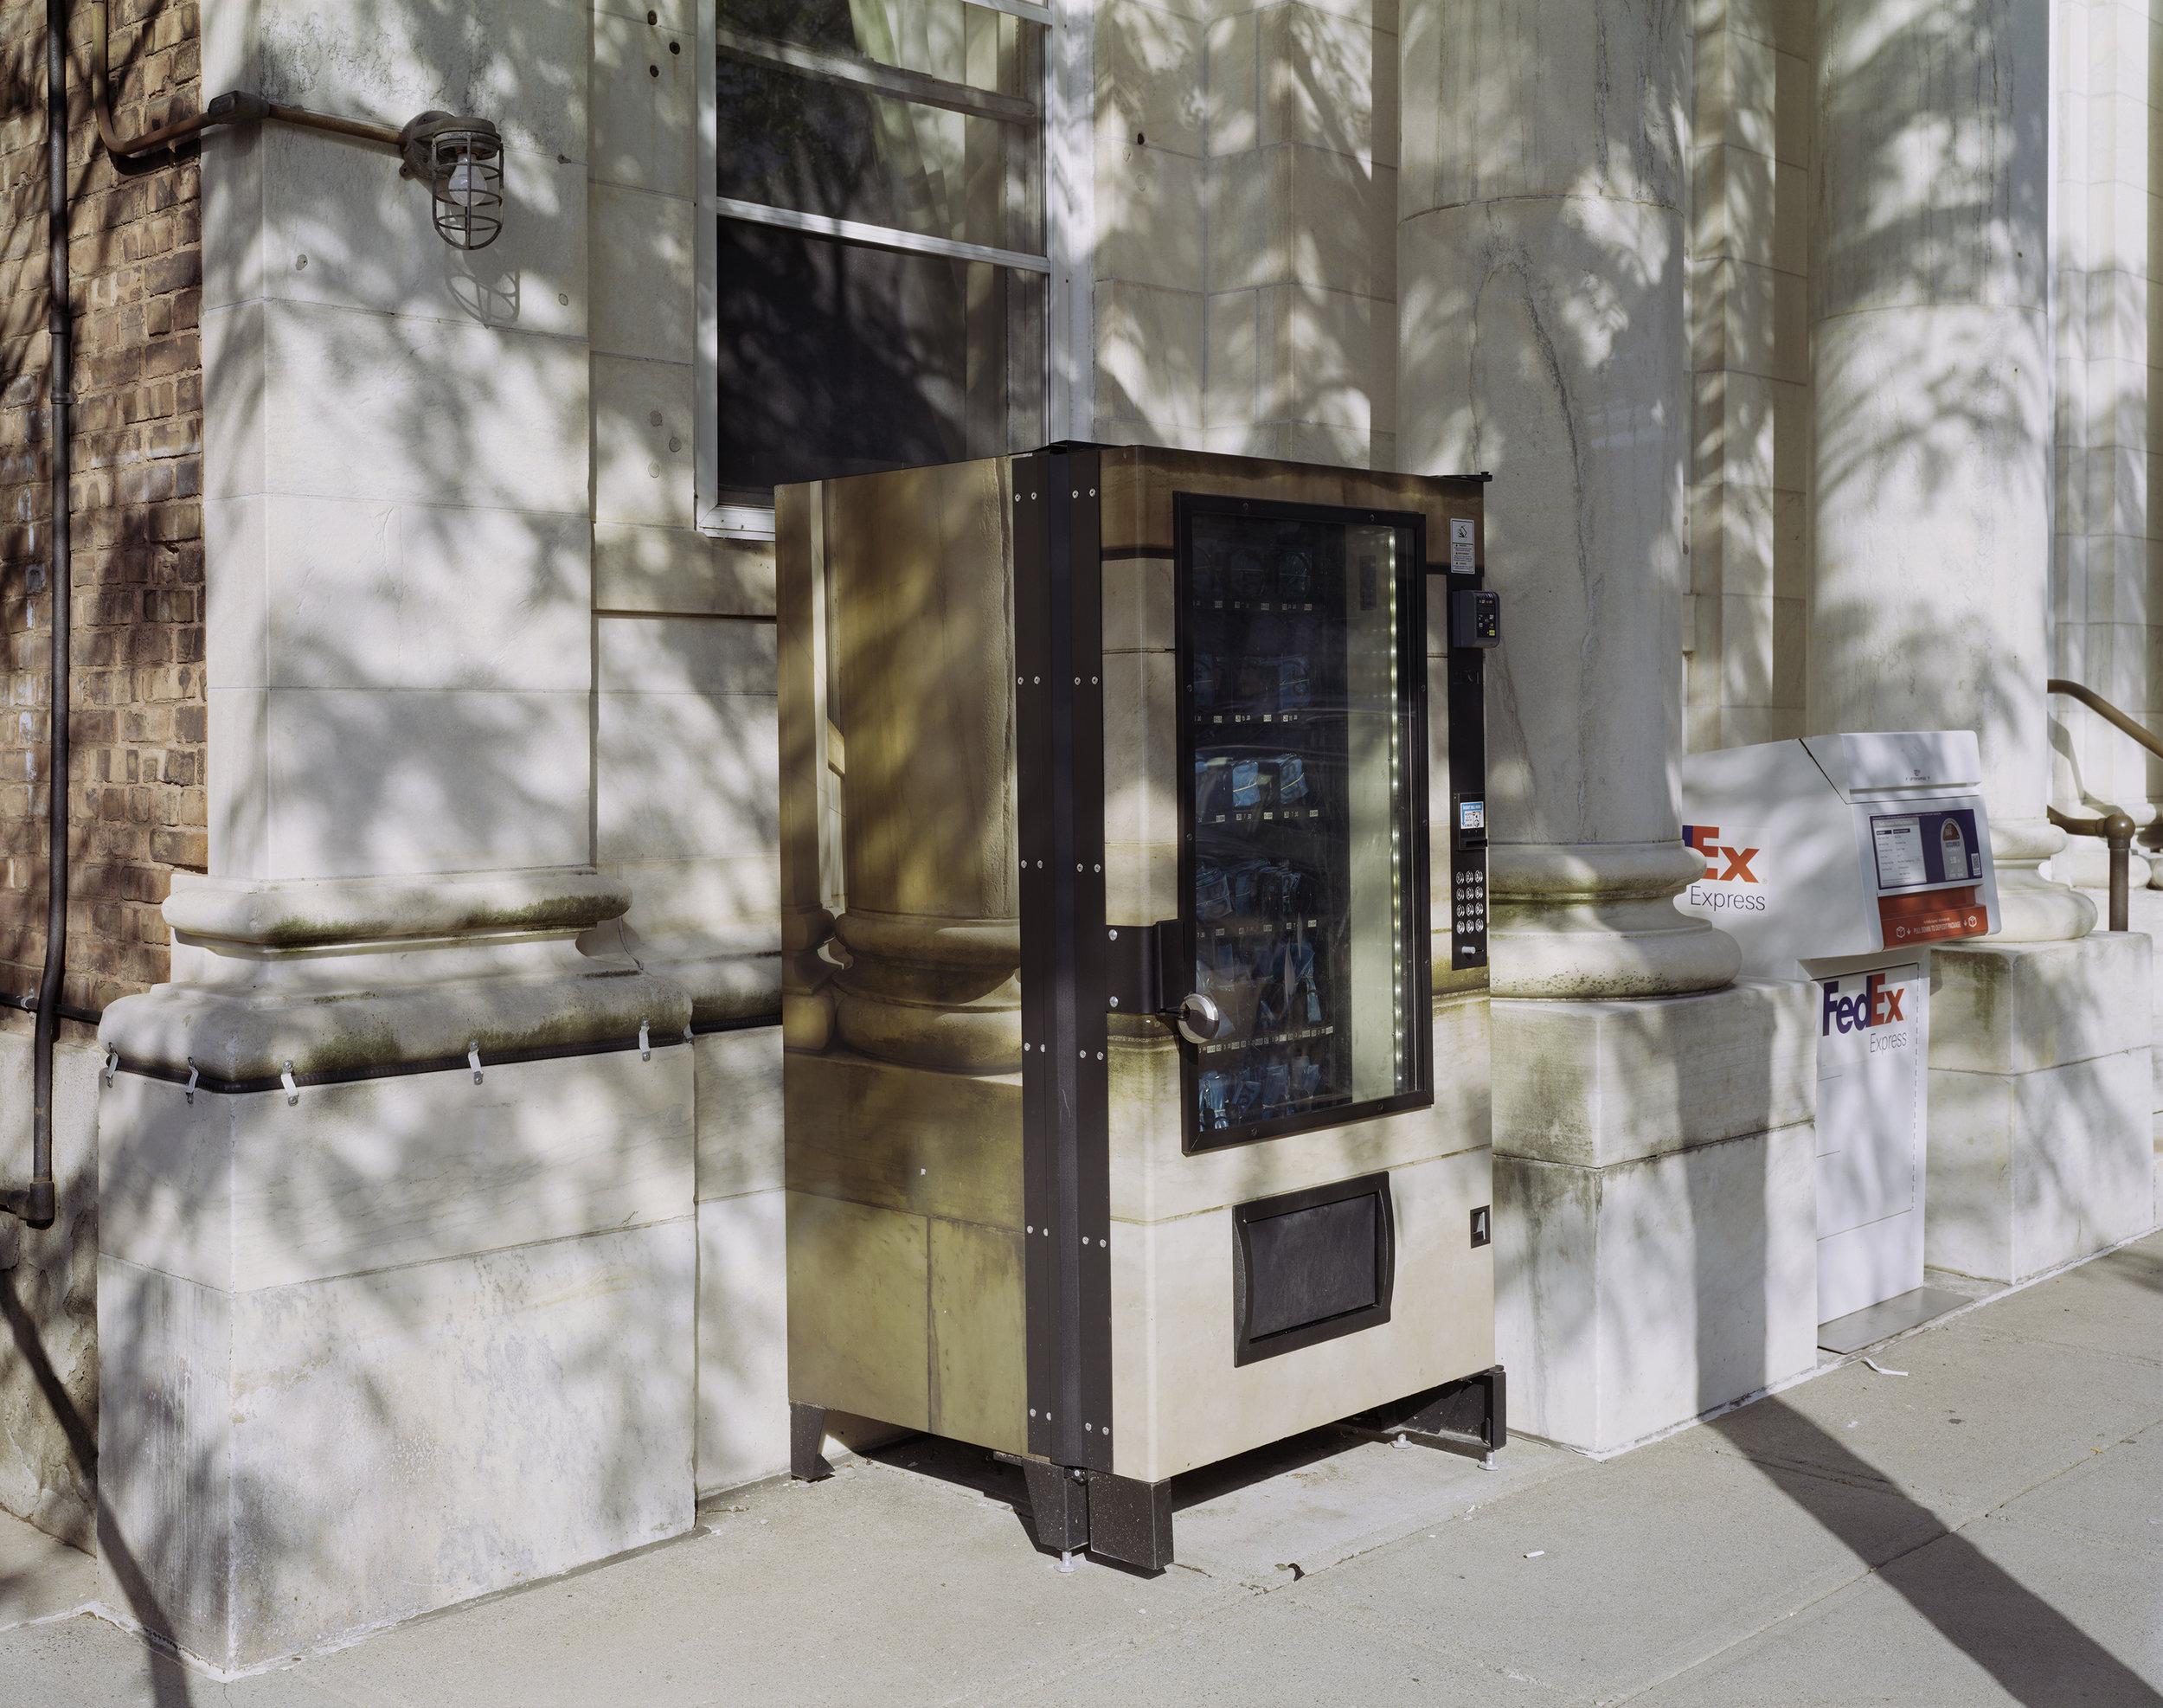 Trashbag Vending Machine copy.jpg